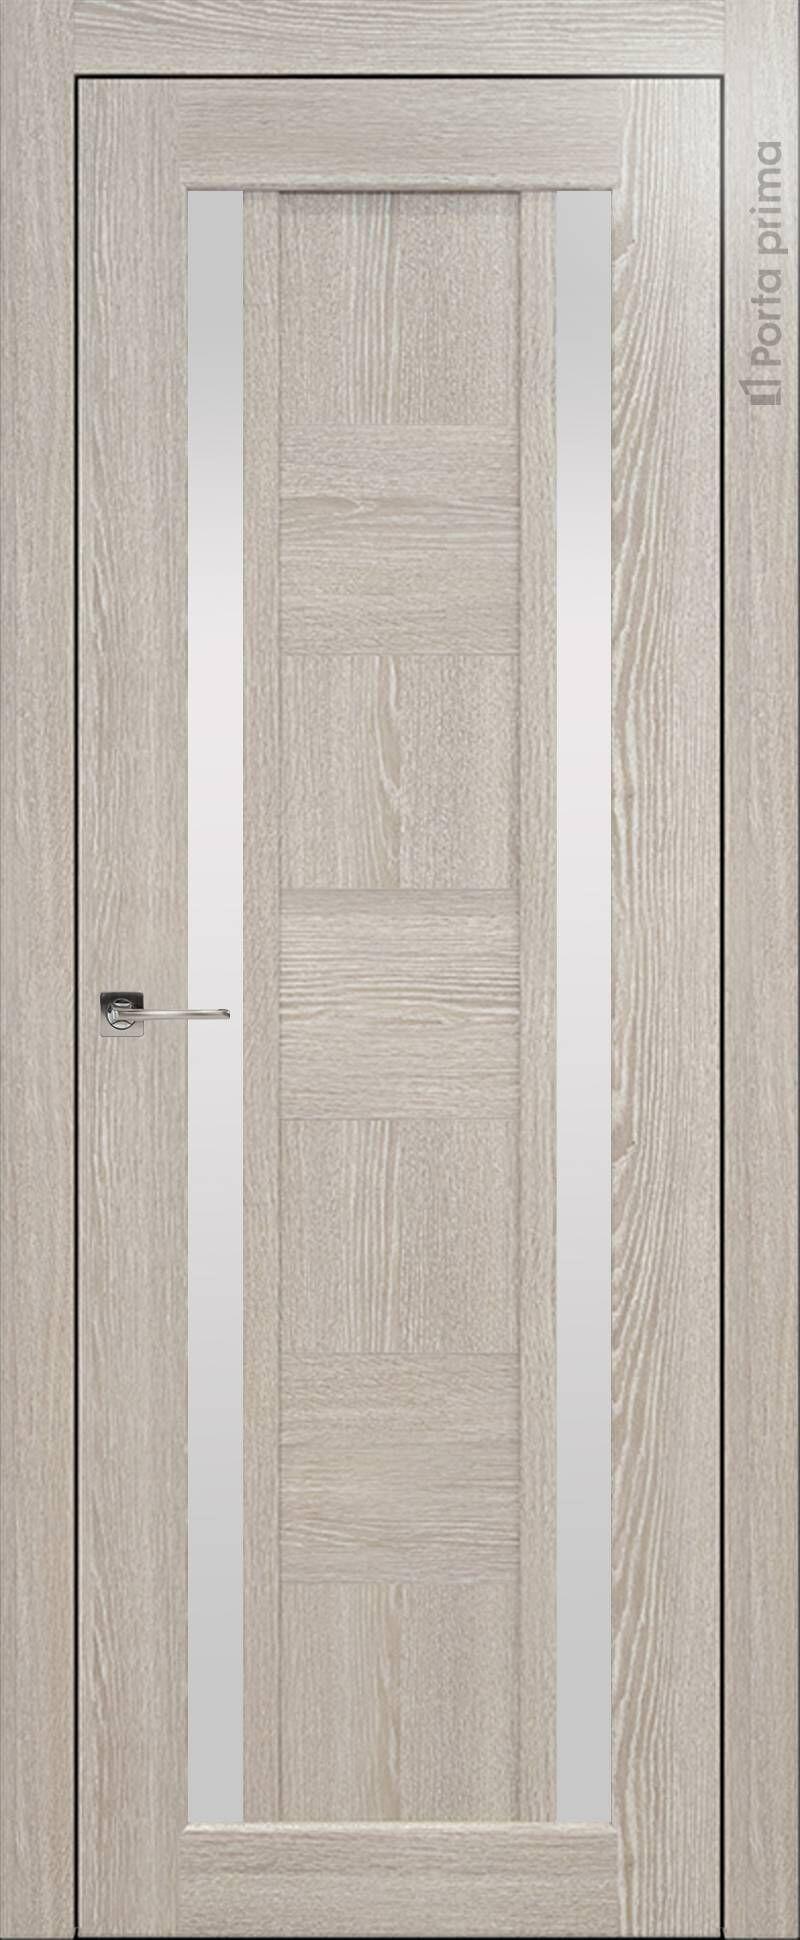 Palazzo цвет - Серый дуб Без стекла (ДГ)